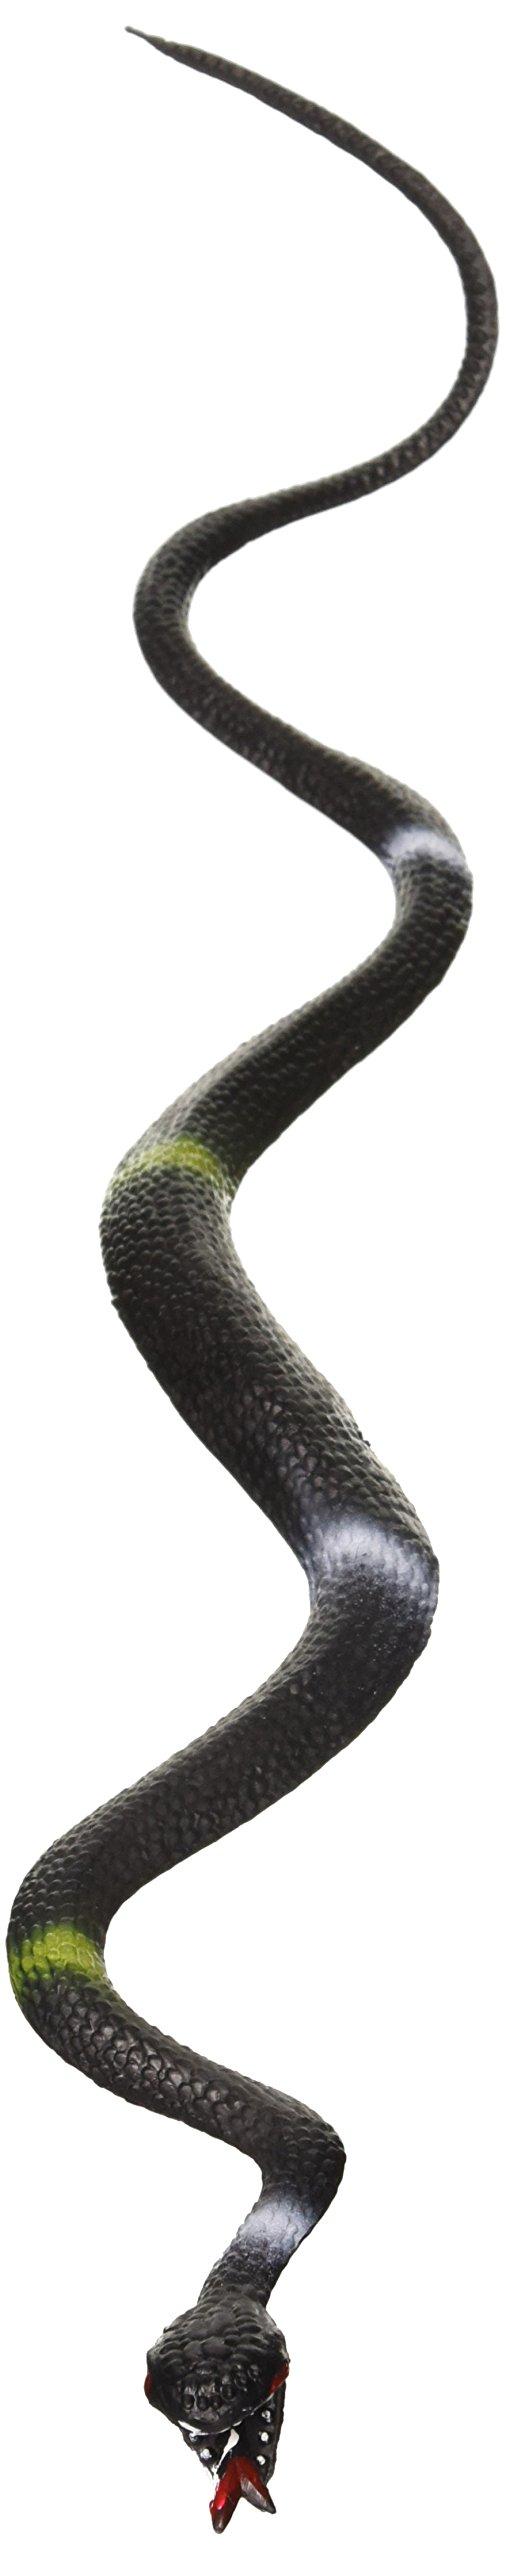 Rhode Island Novelty 24 Green Garden Snakes Great to Keep Birds Away Rubber Toy 24''